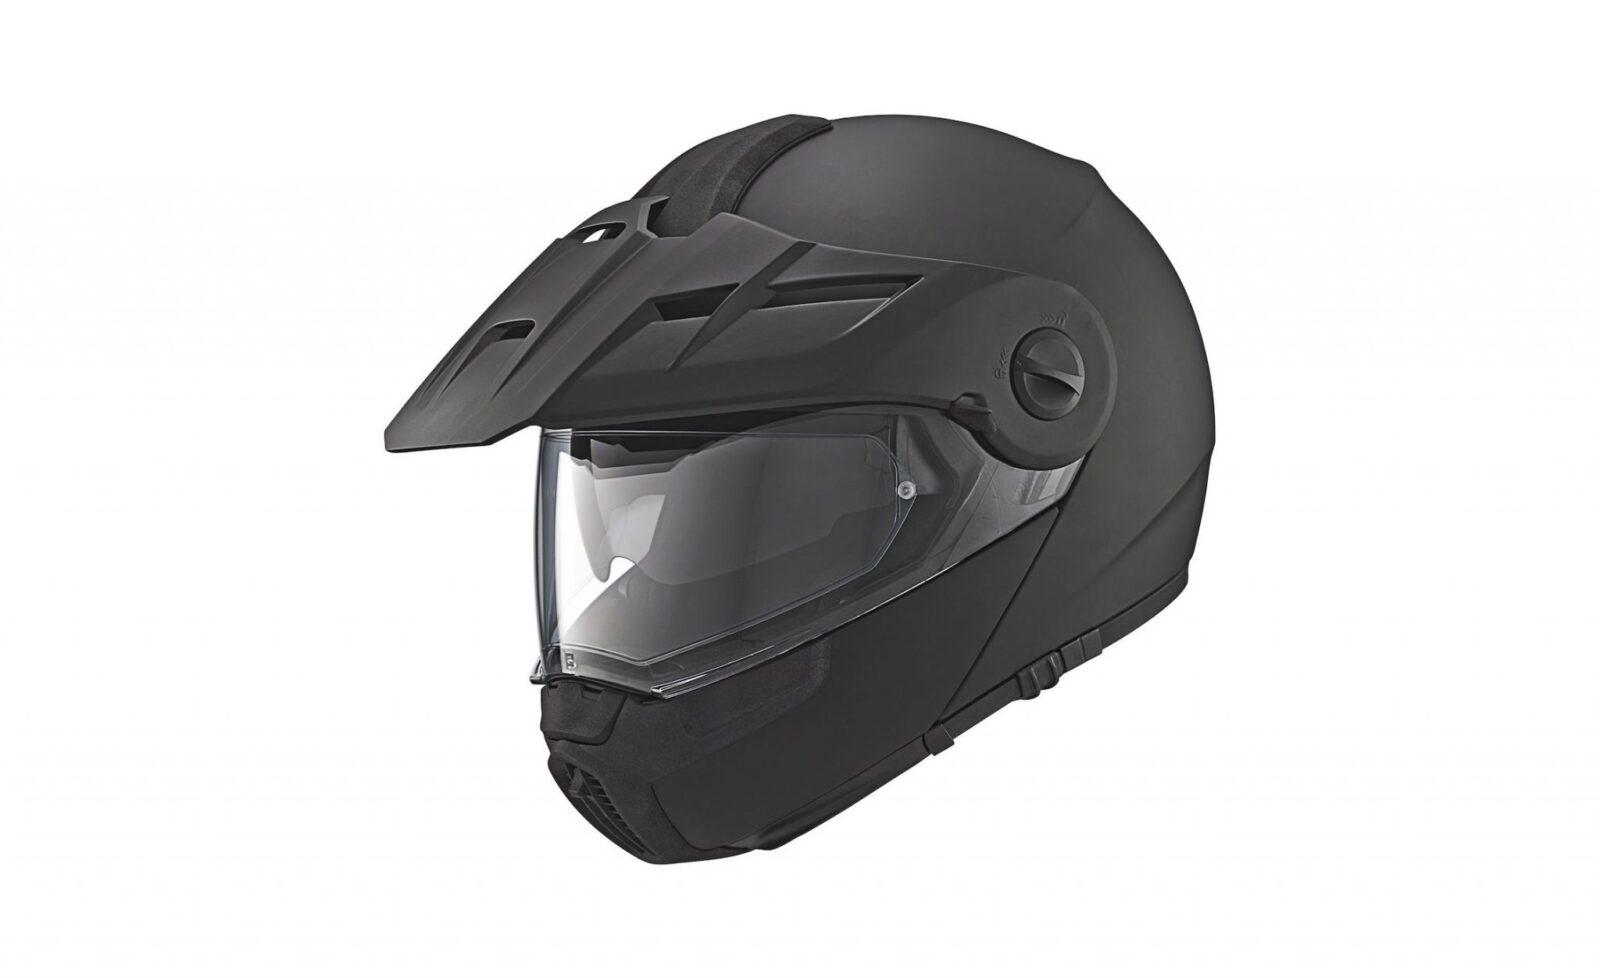 Schuberth E1 Adventure Helmet 1600x978 - Schuberth E1 Adventure Helmet